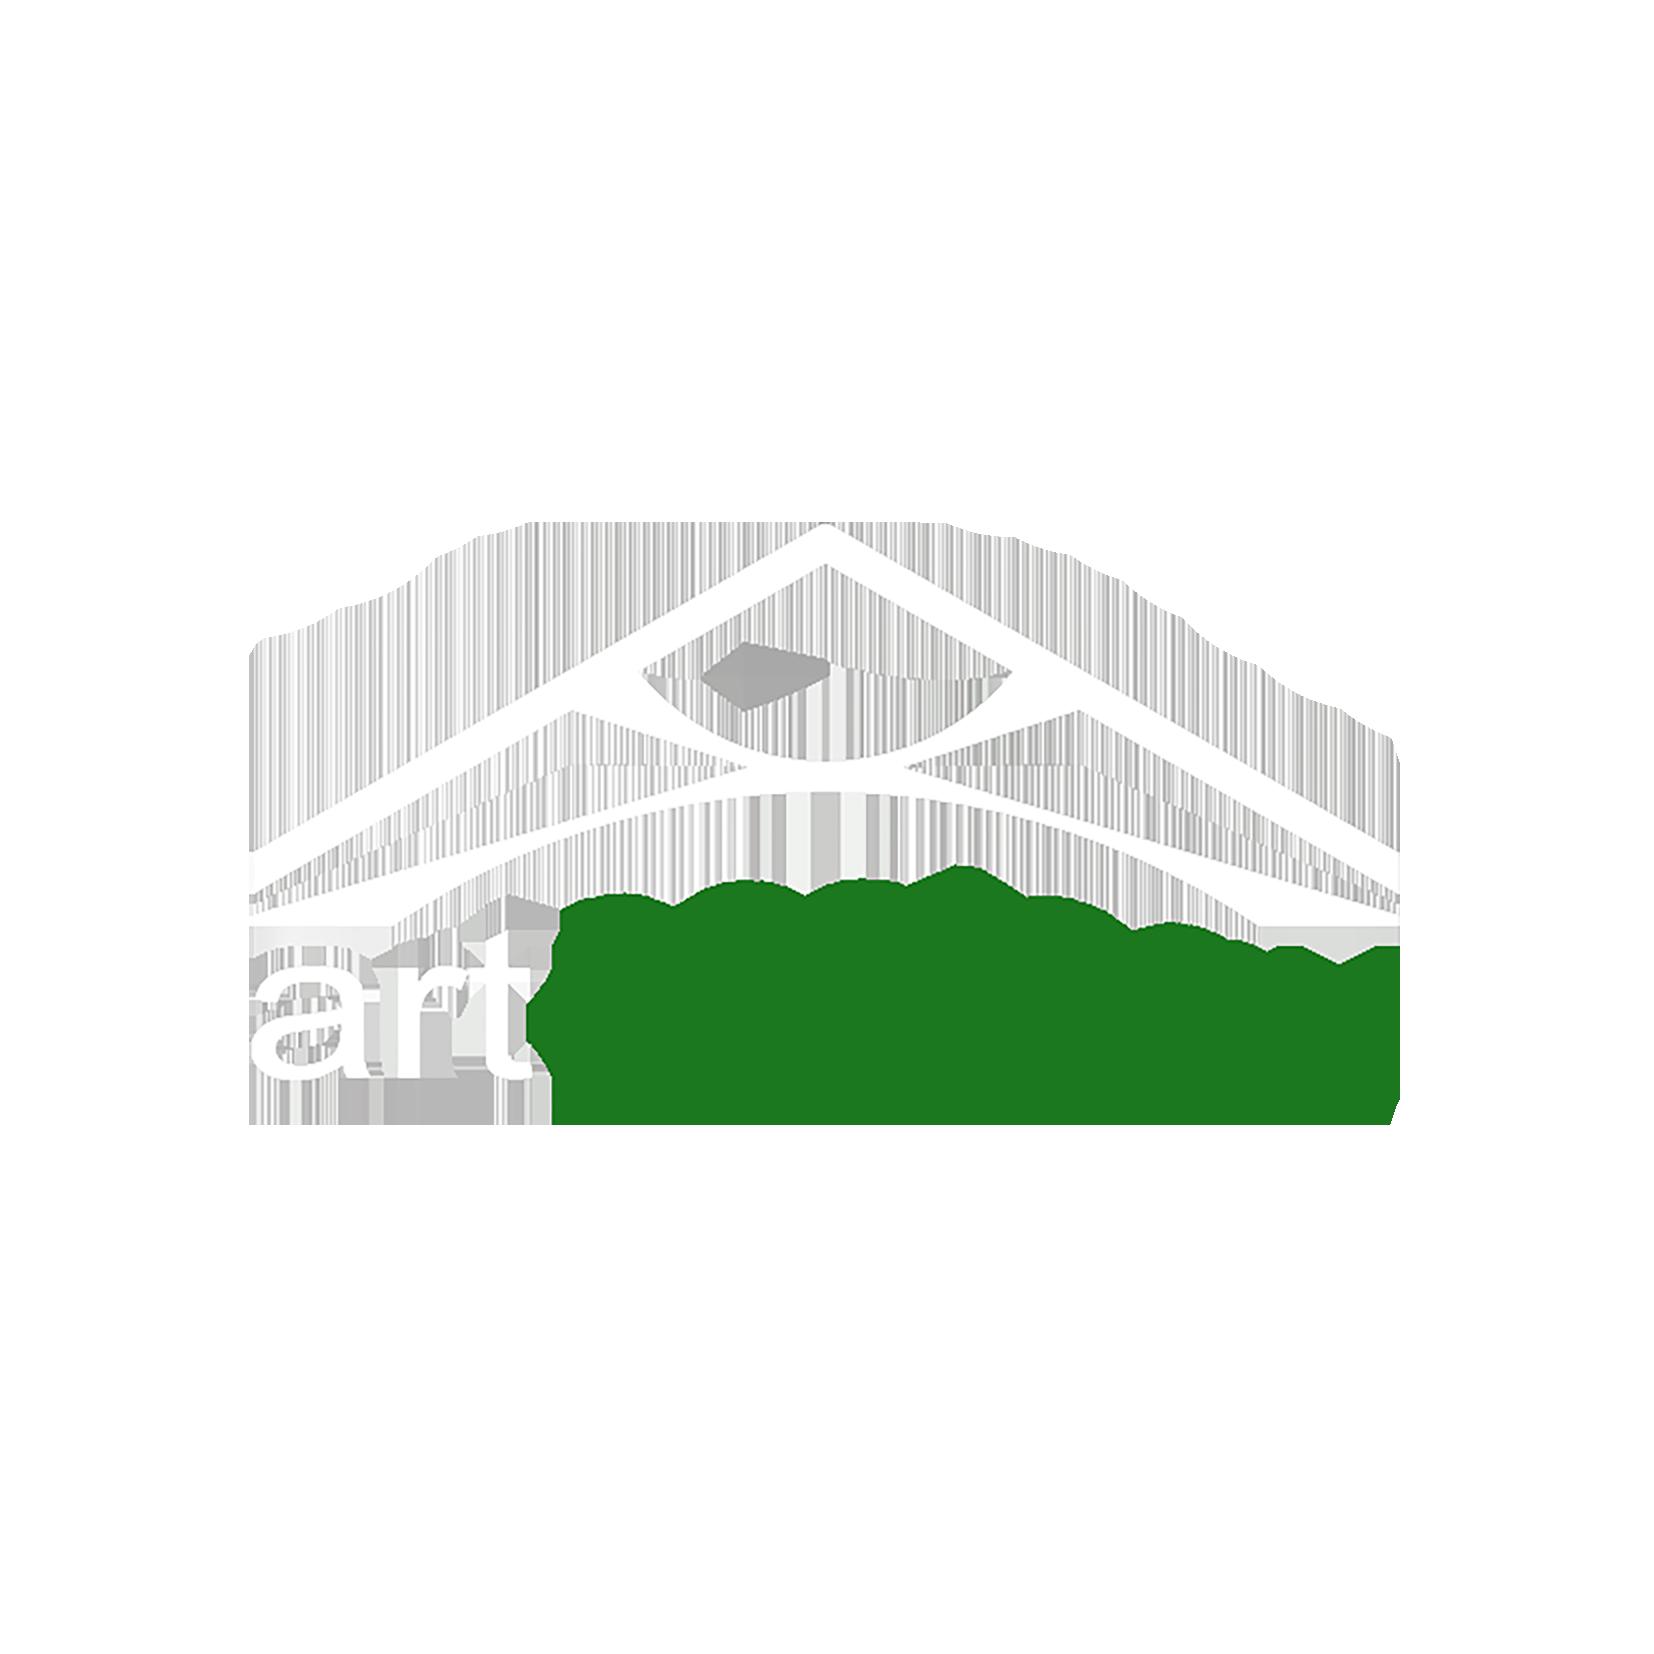 ArtEcology